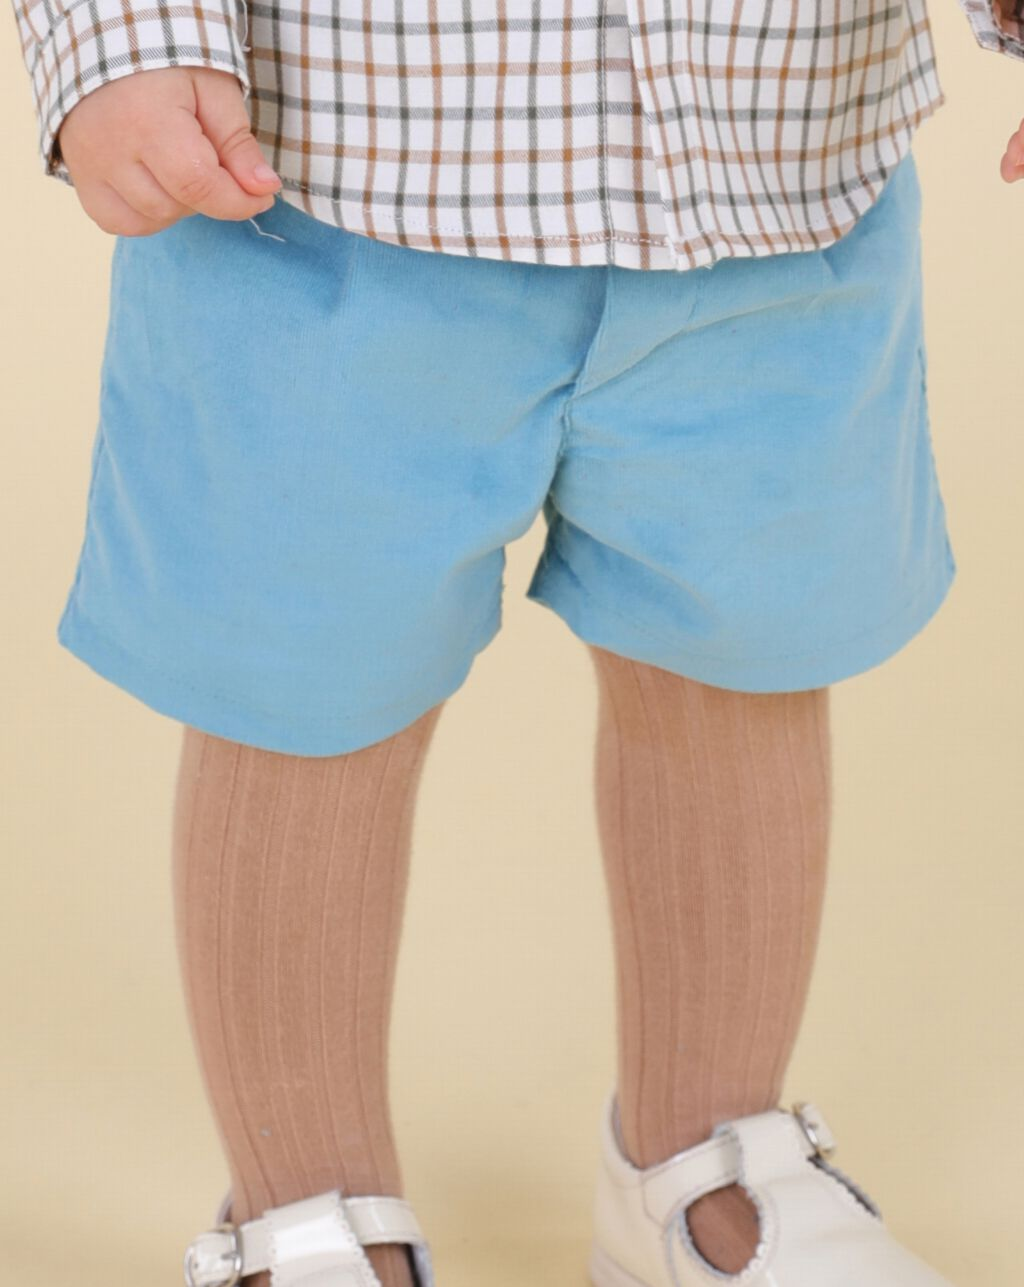 Pan con Chocolate: Shorts Silvio